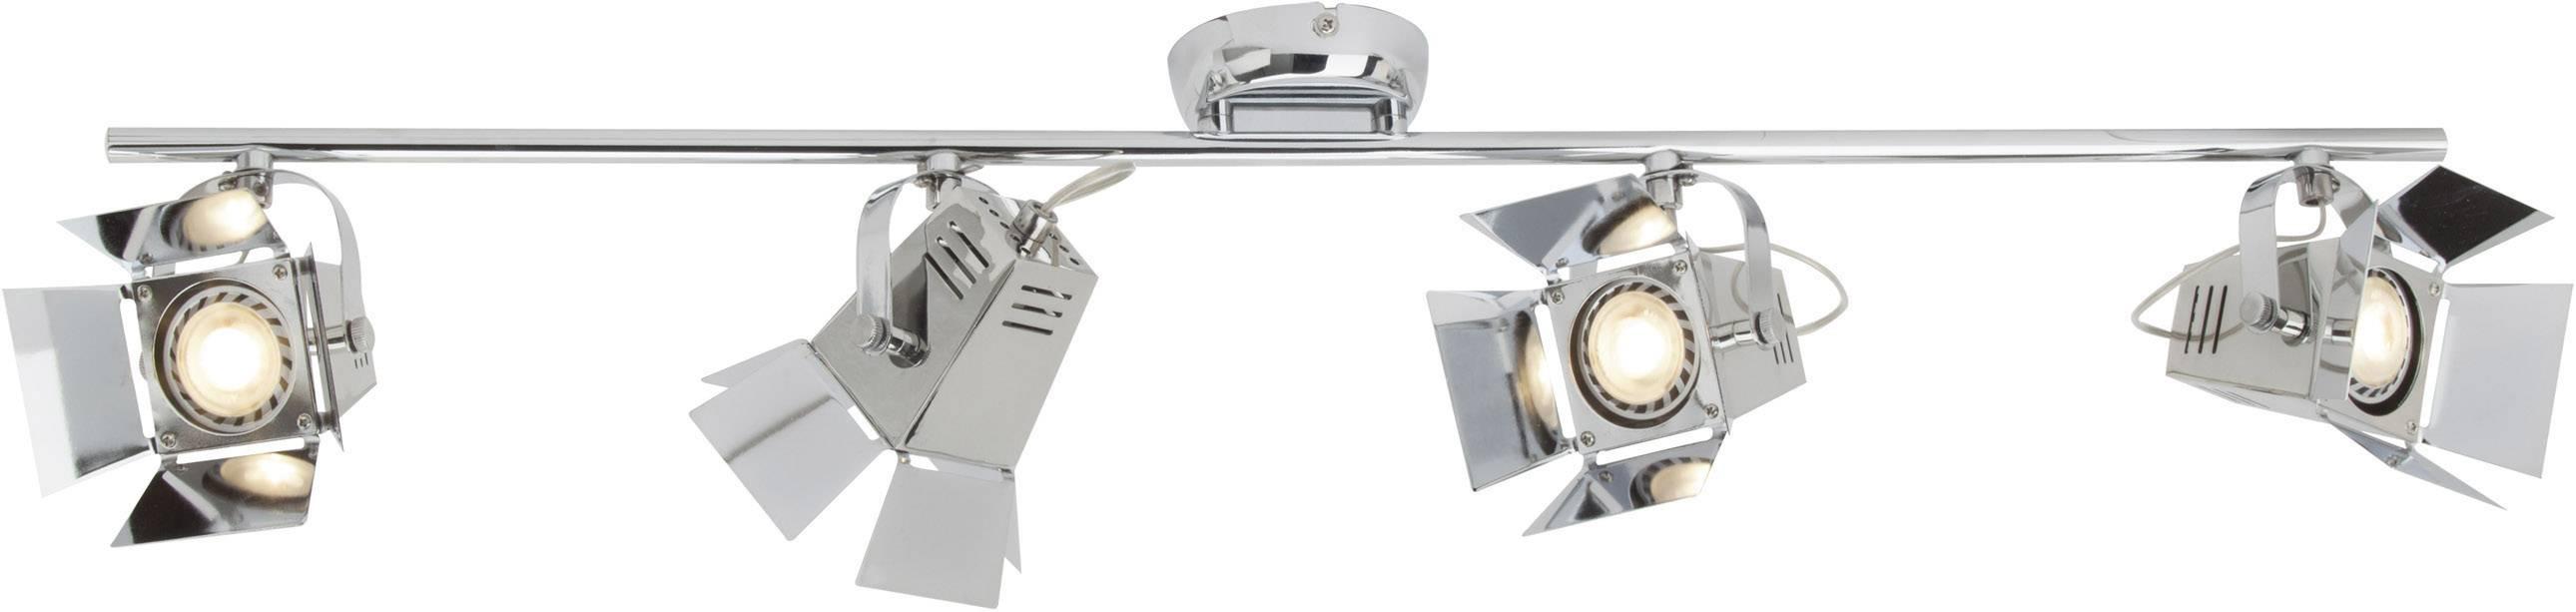 Stropní lampa LED GU10 20 W Brilliant Movie G08931/15 chrom